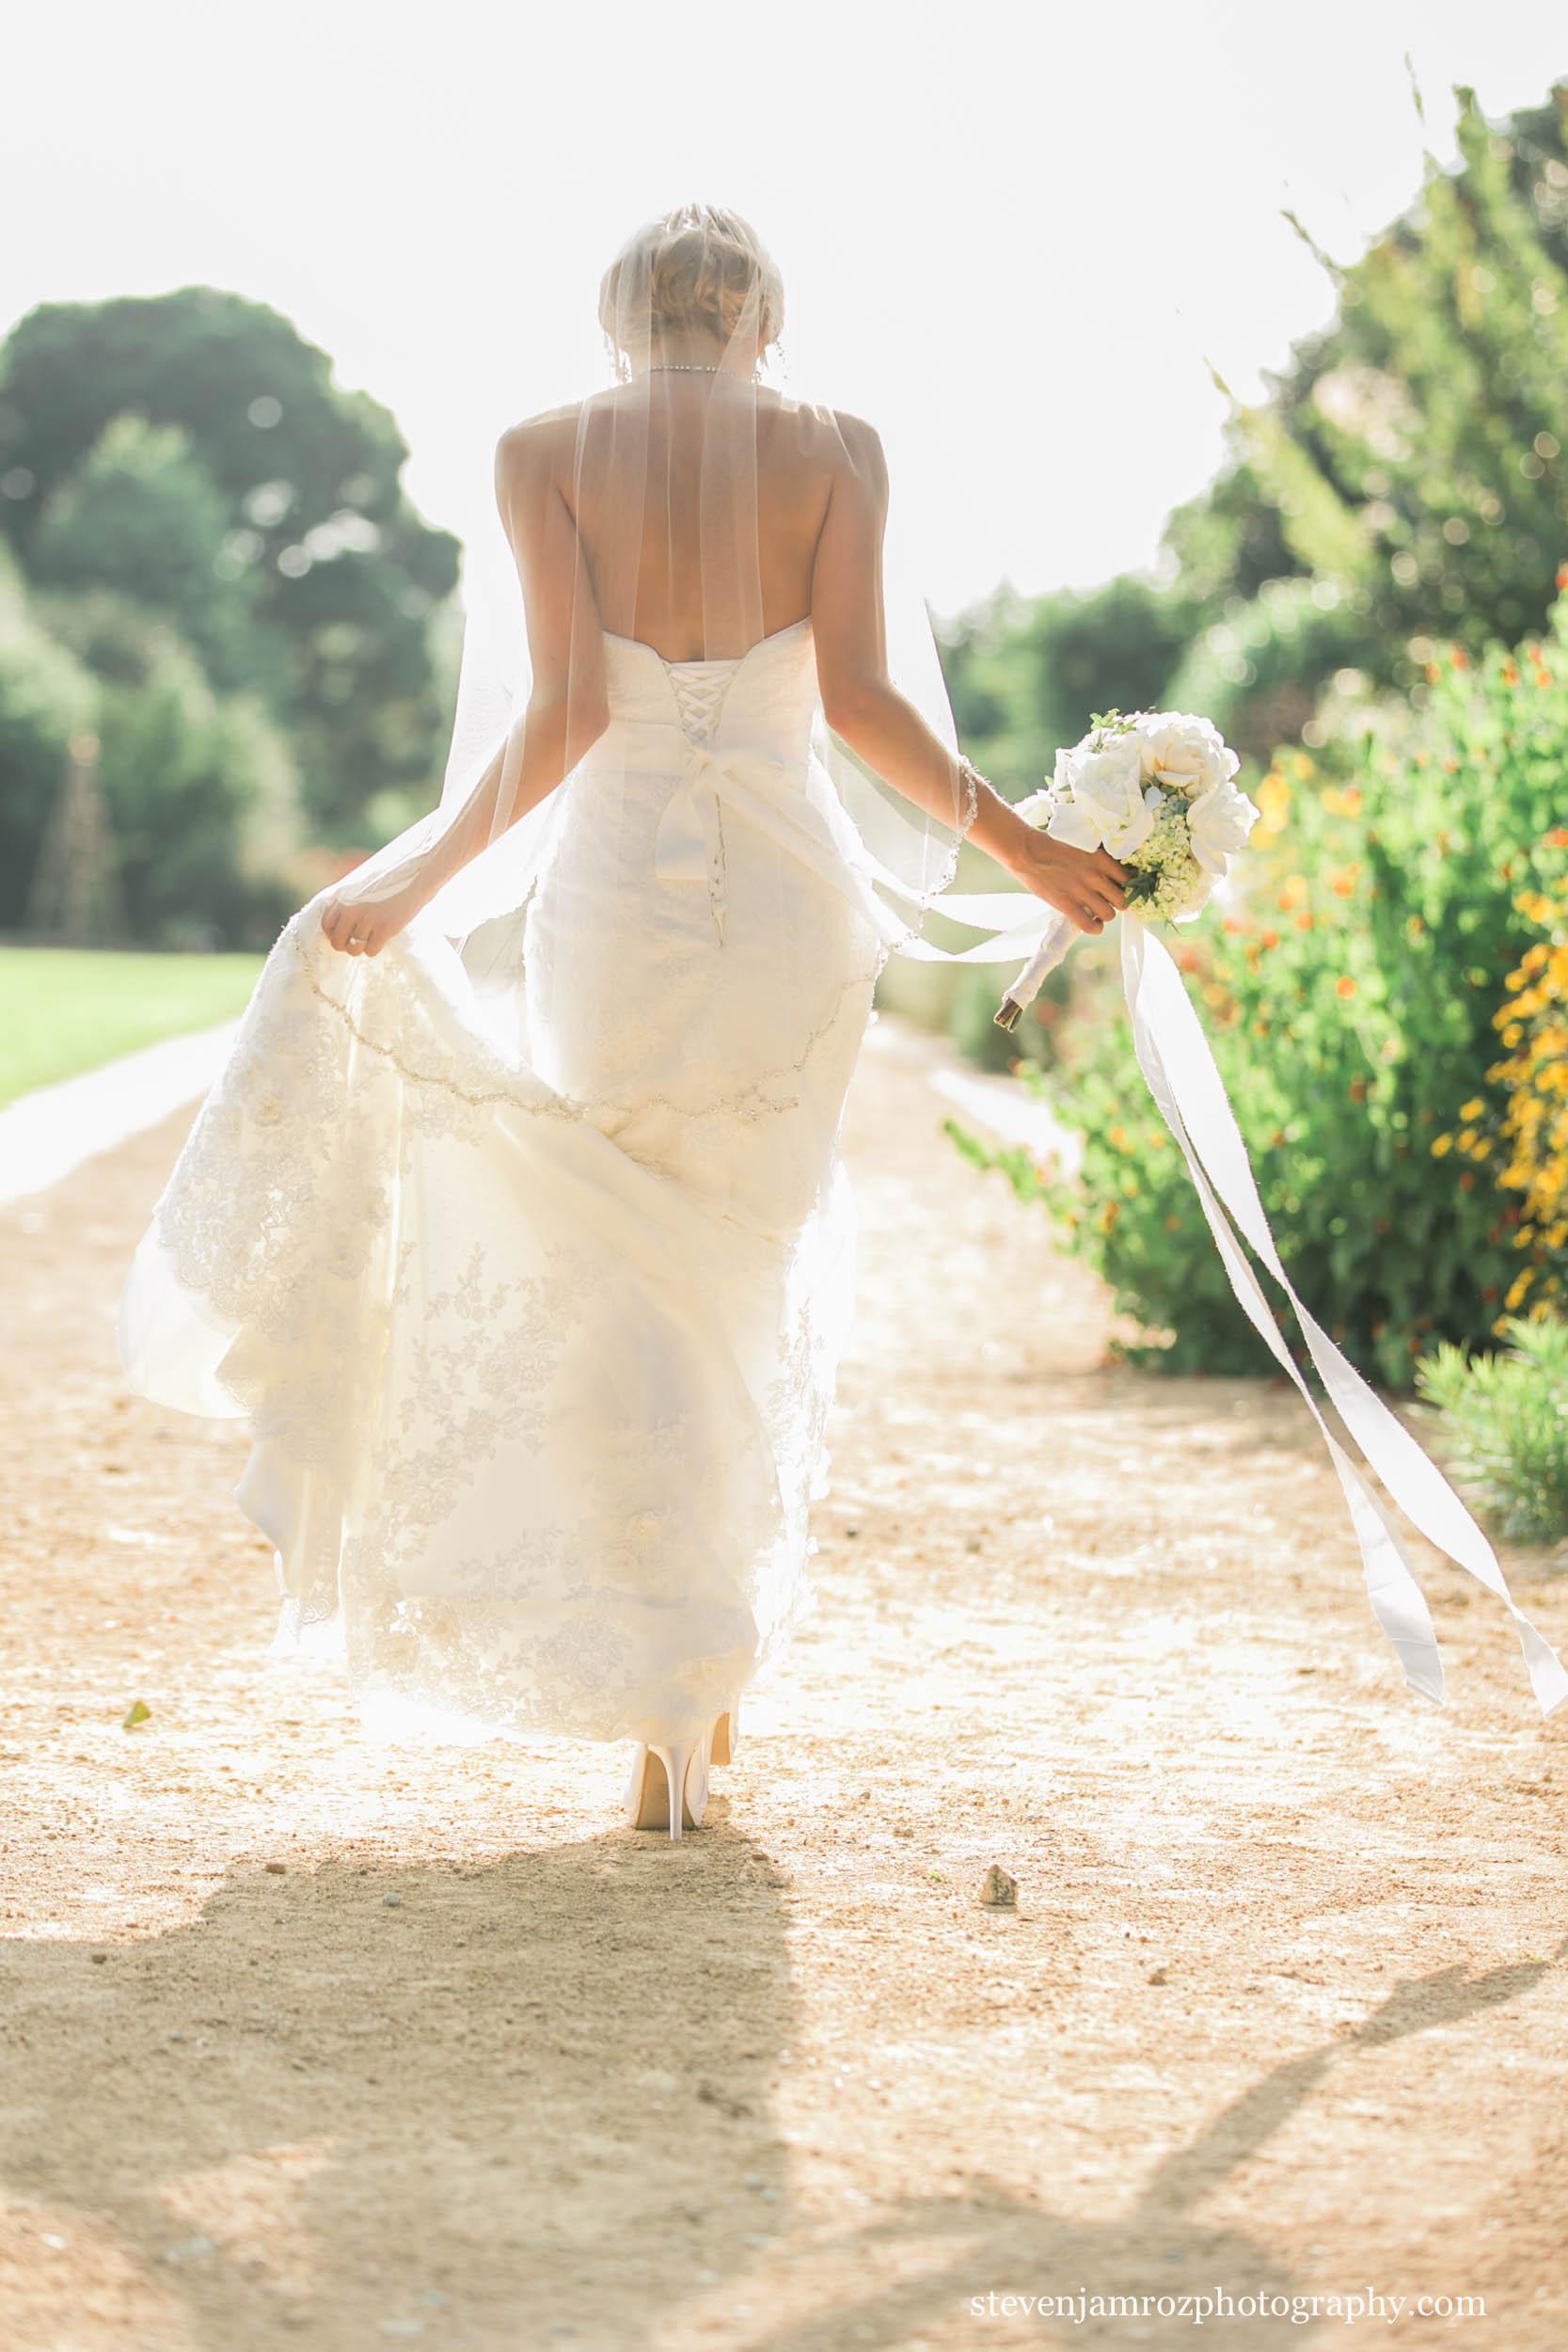 natural-light-bridal-portraits-raleigh-steven-jamroz-photography-0579.jpg